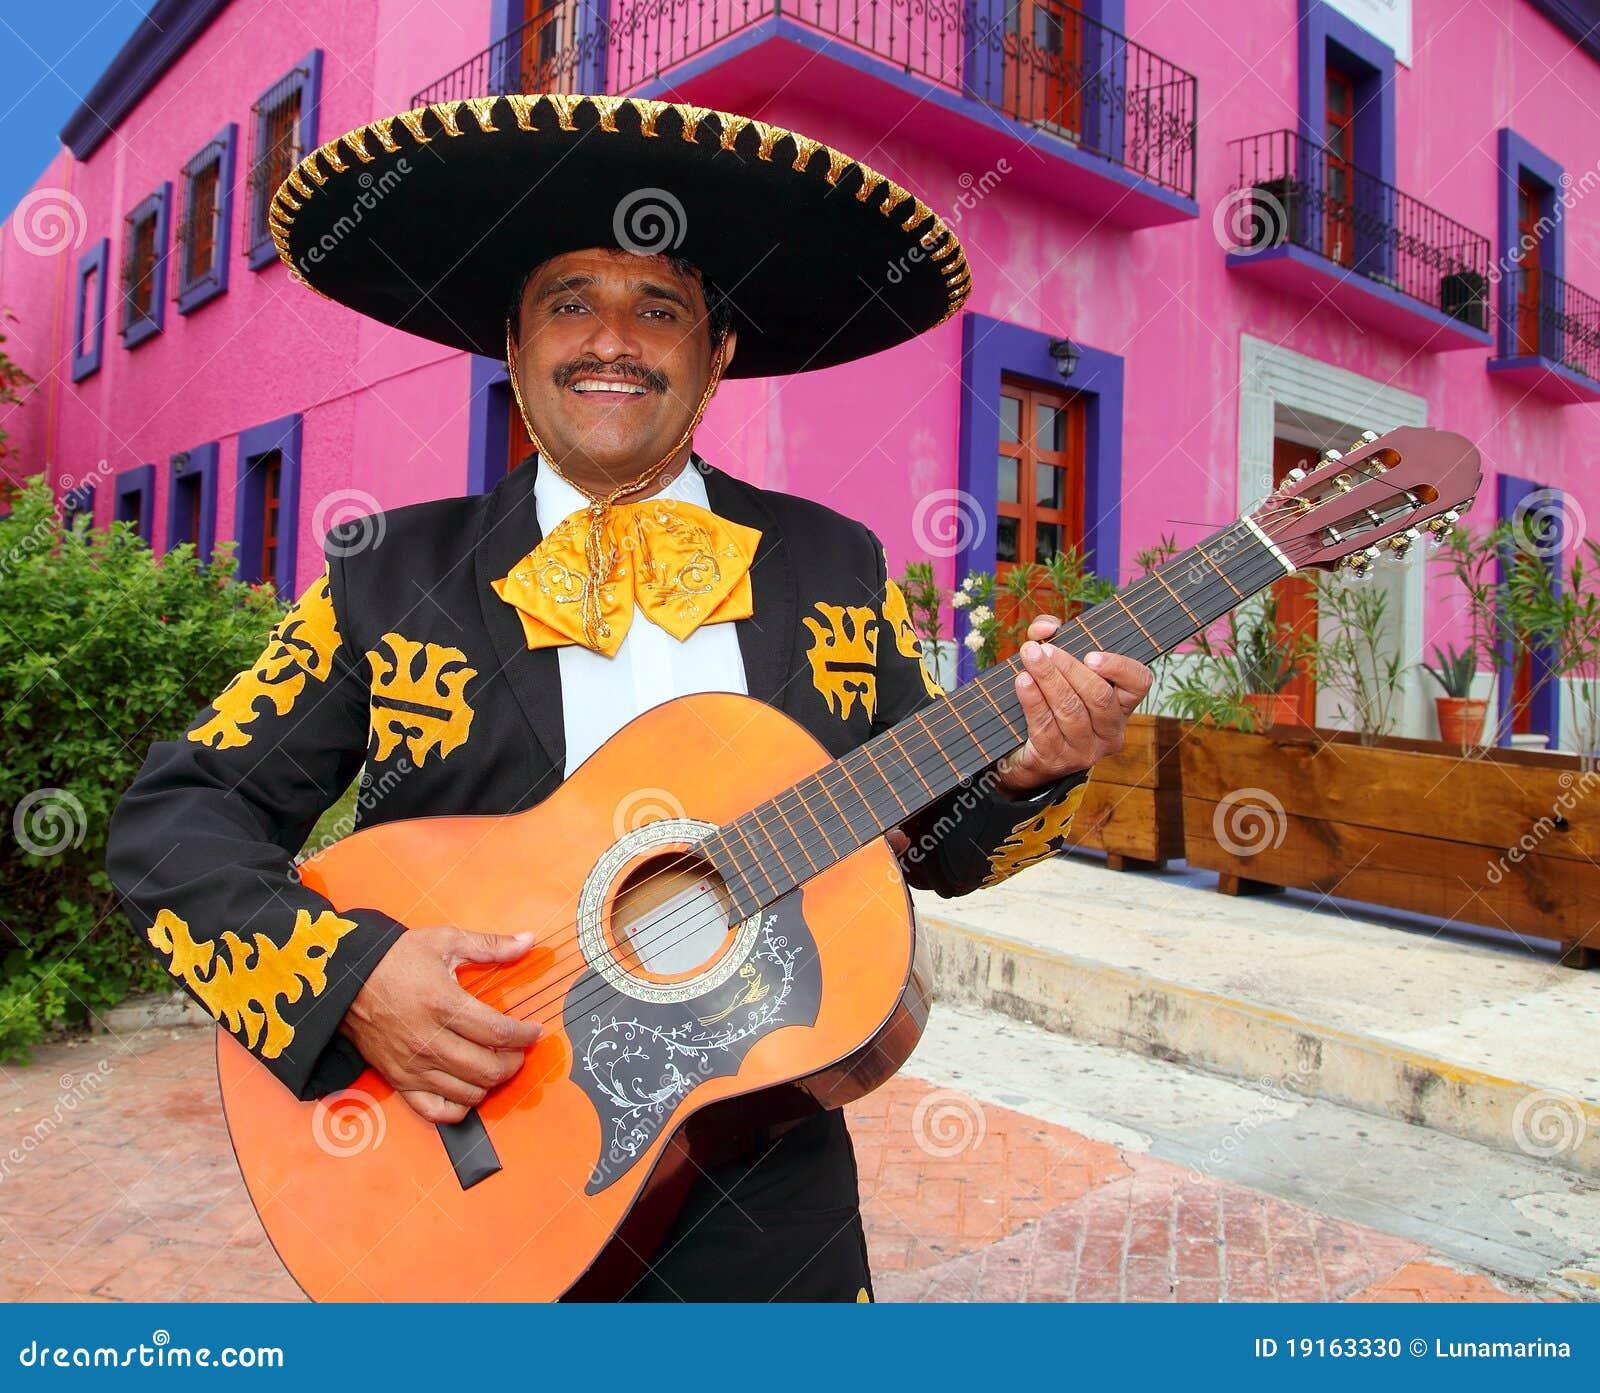 Charrogitarren houses mariachimexico att leka